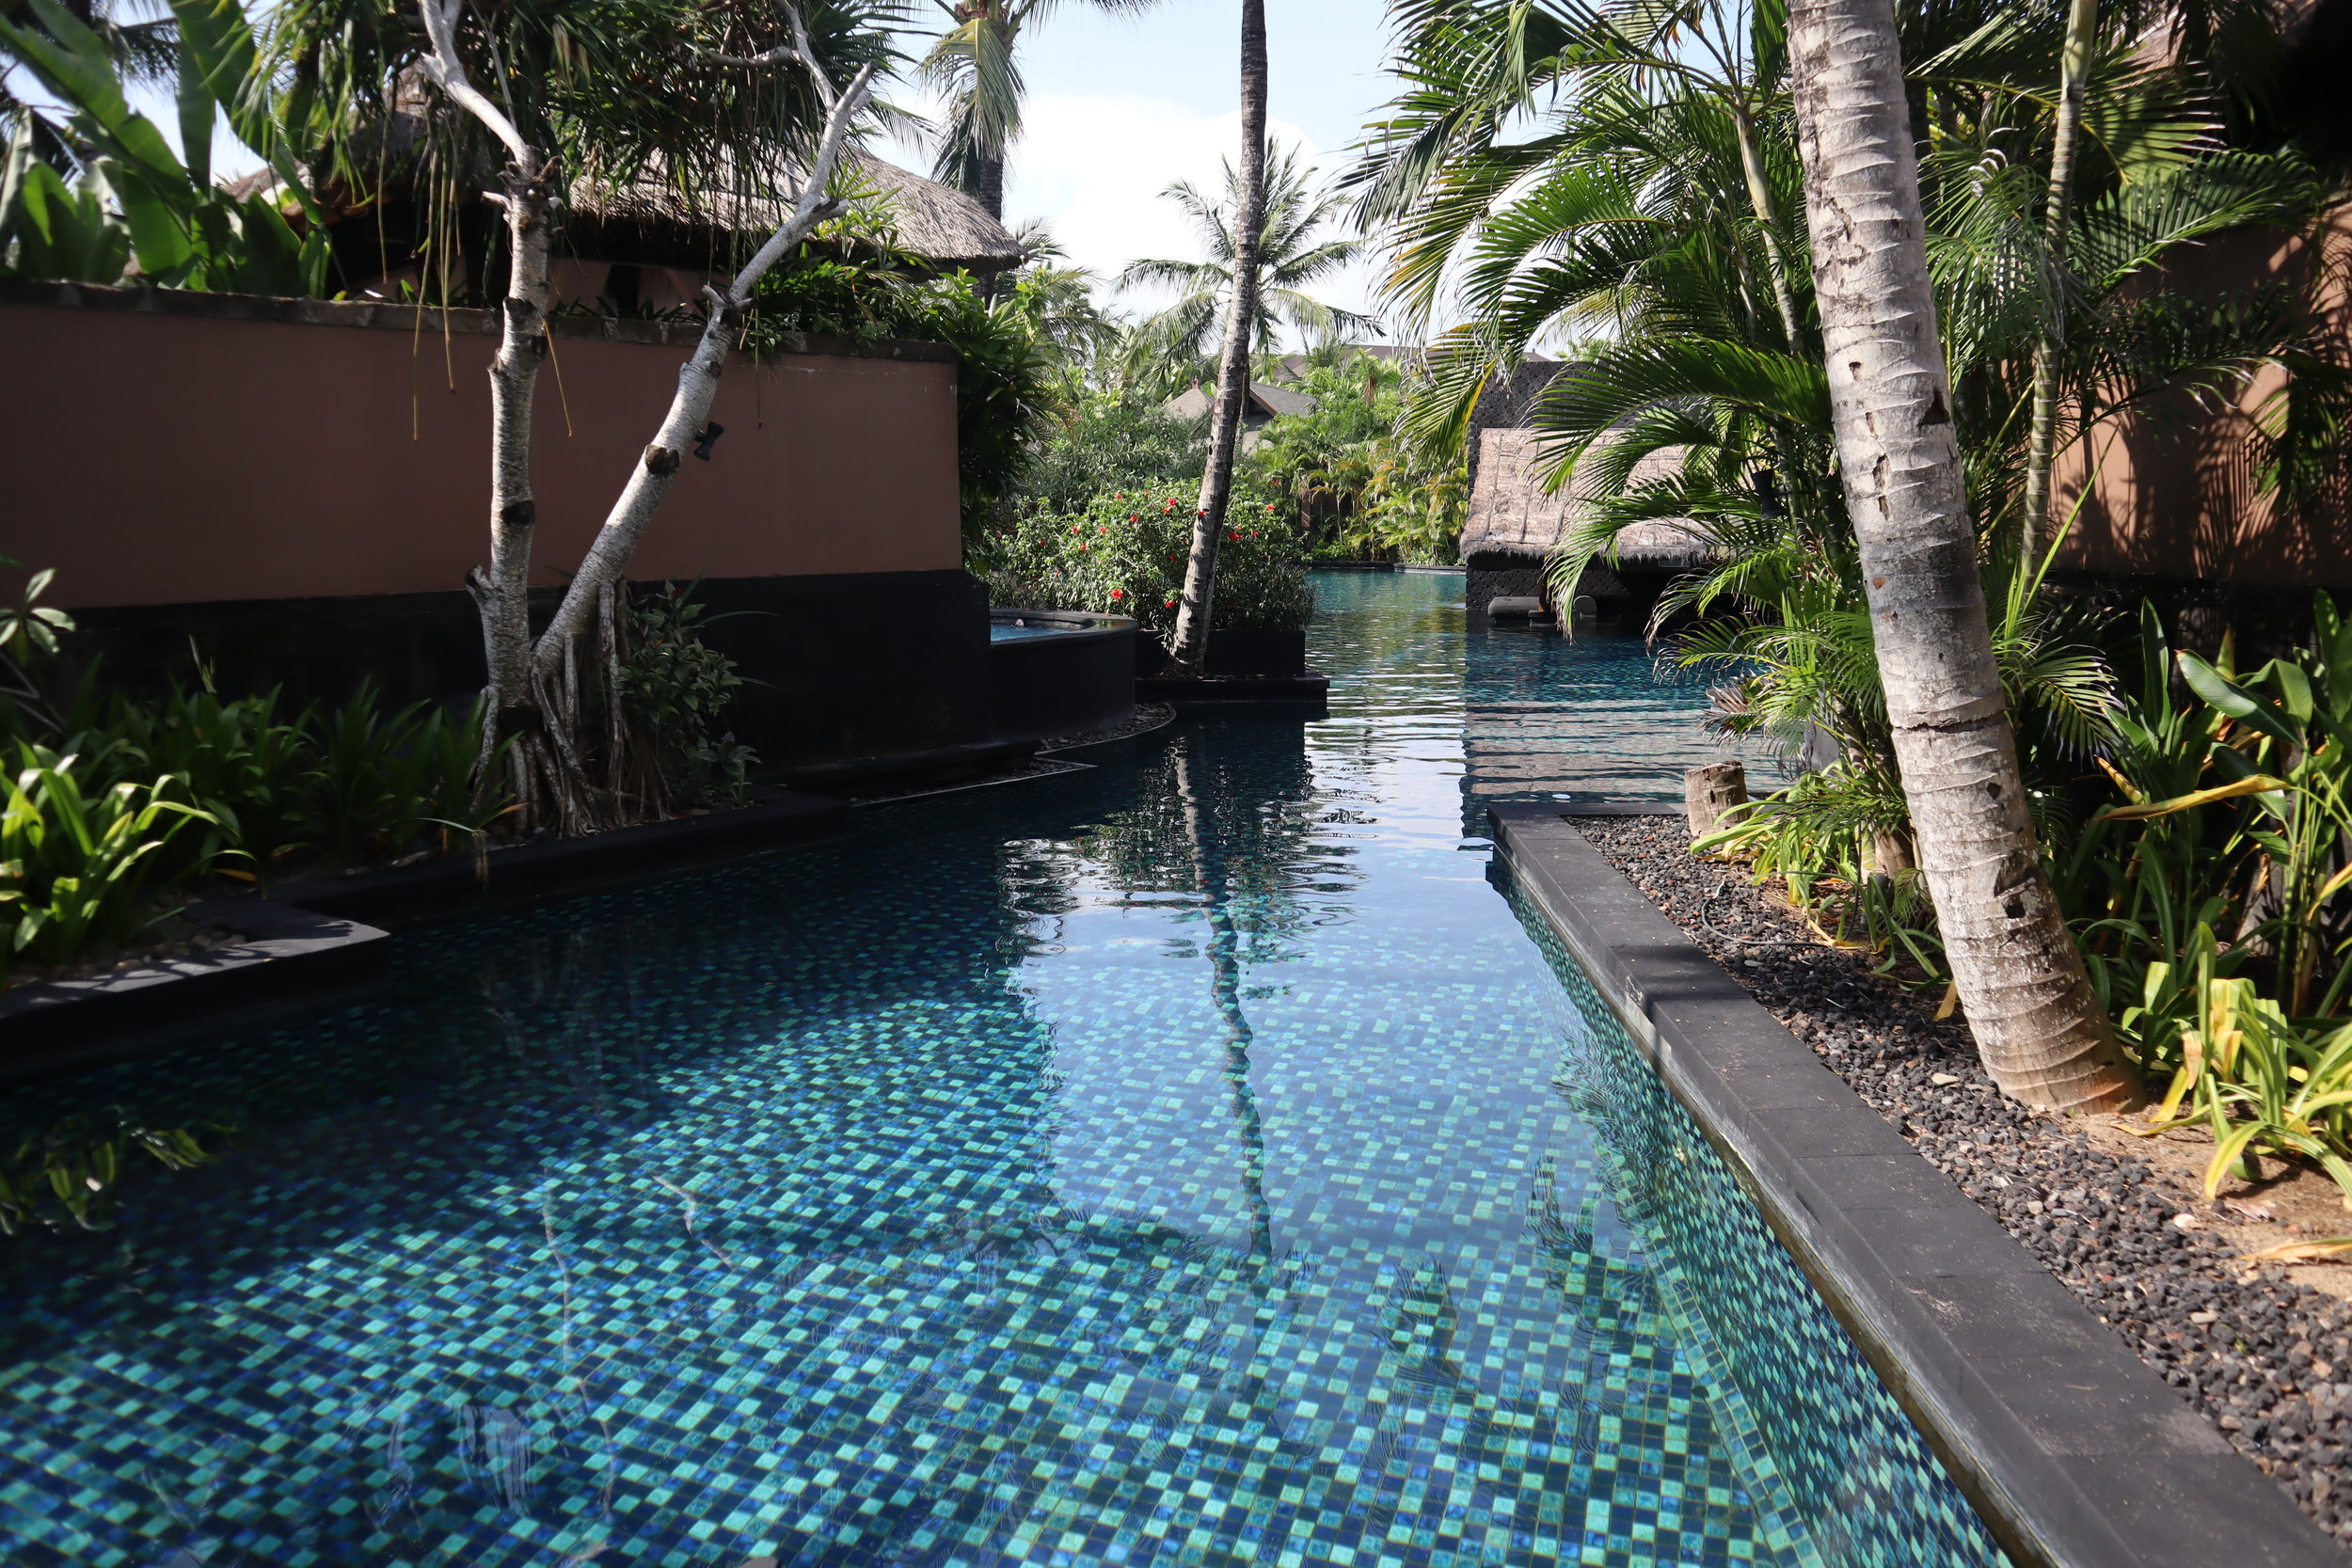 St. Regis Bali – Saltwater lagoon